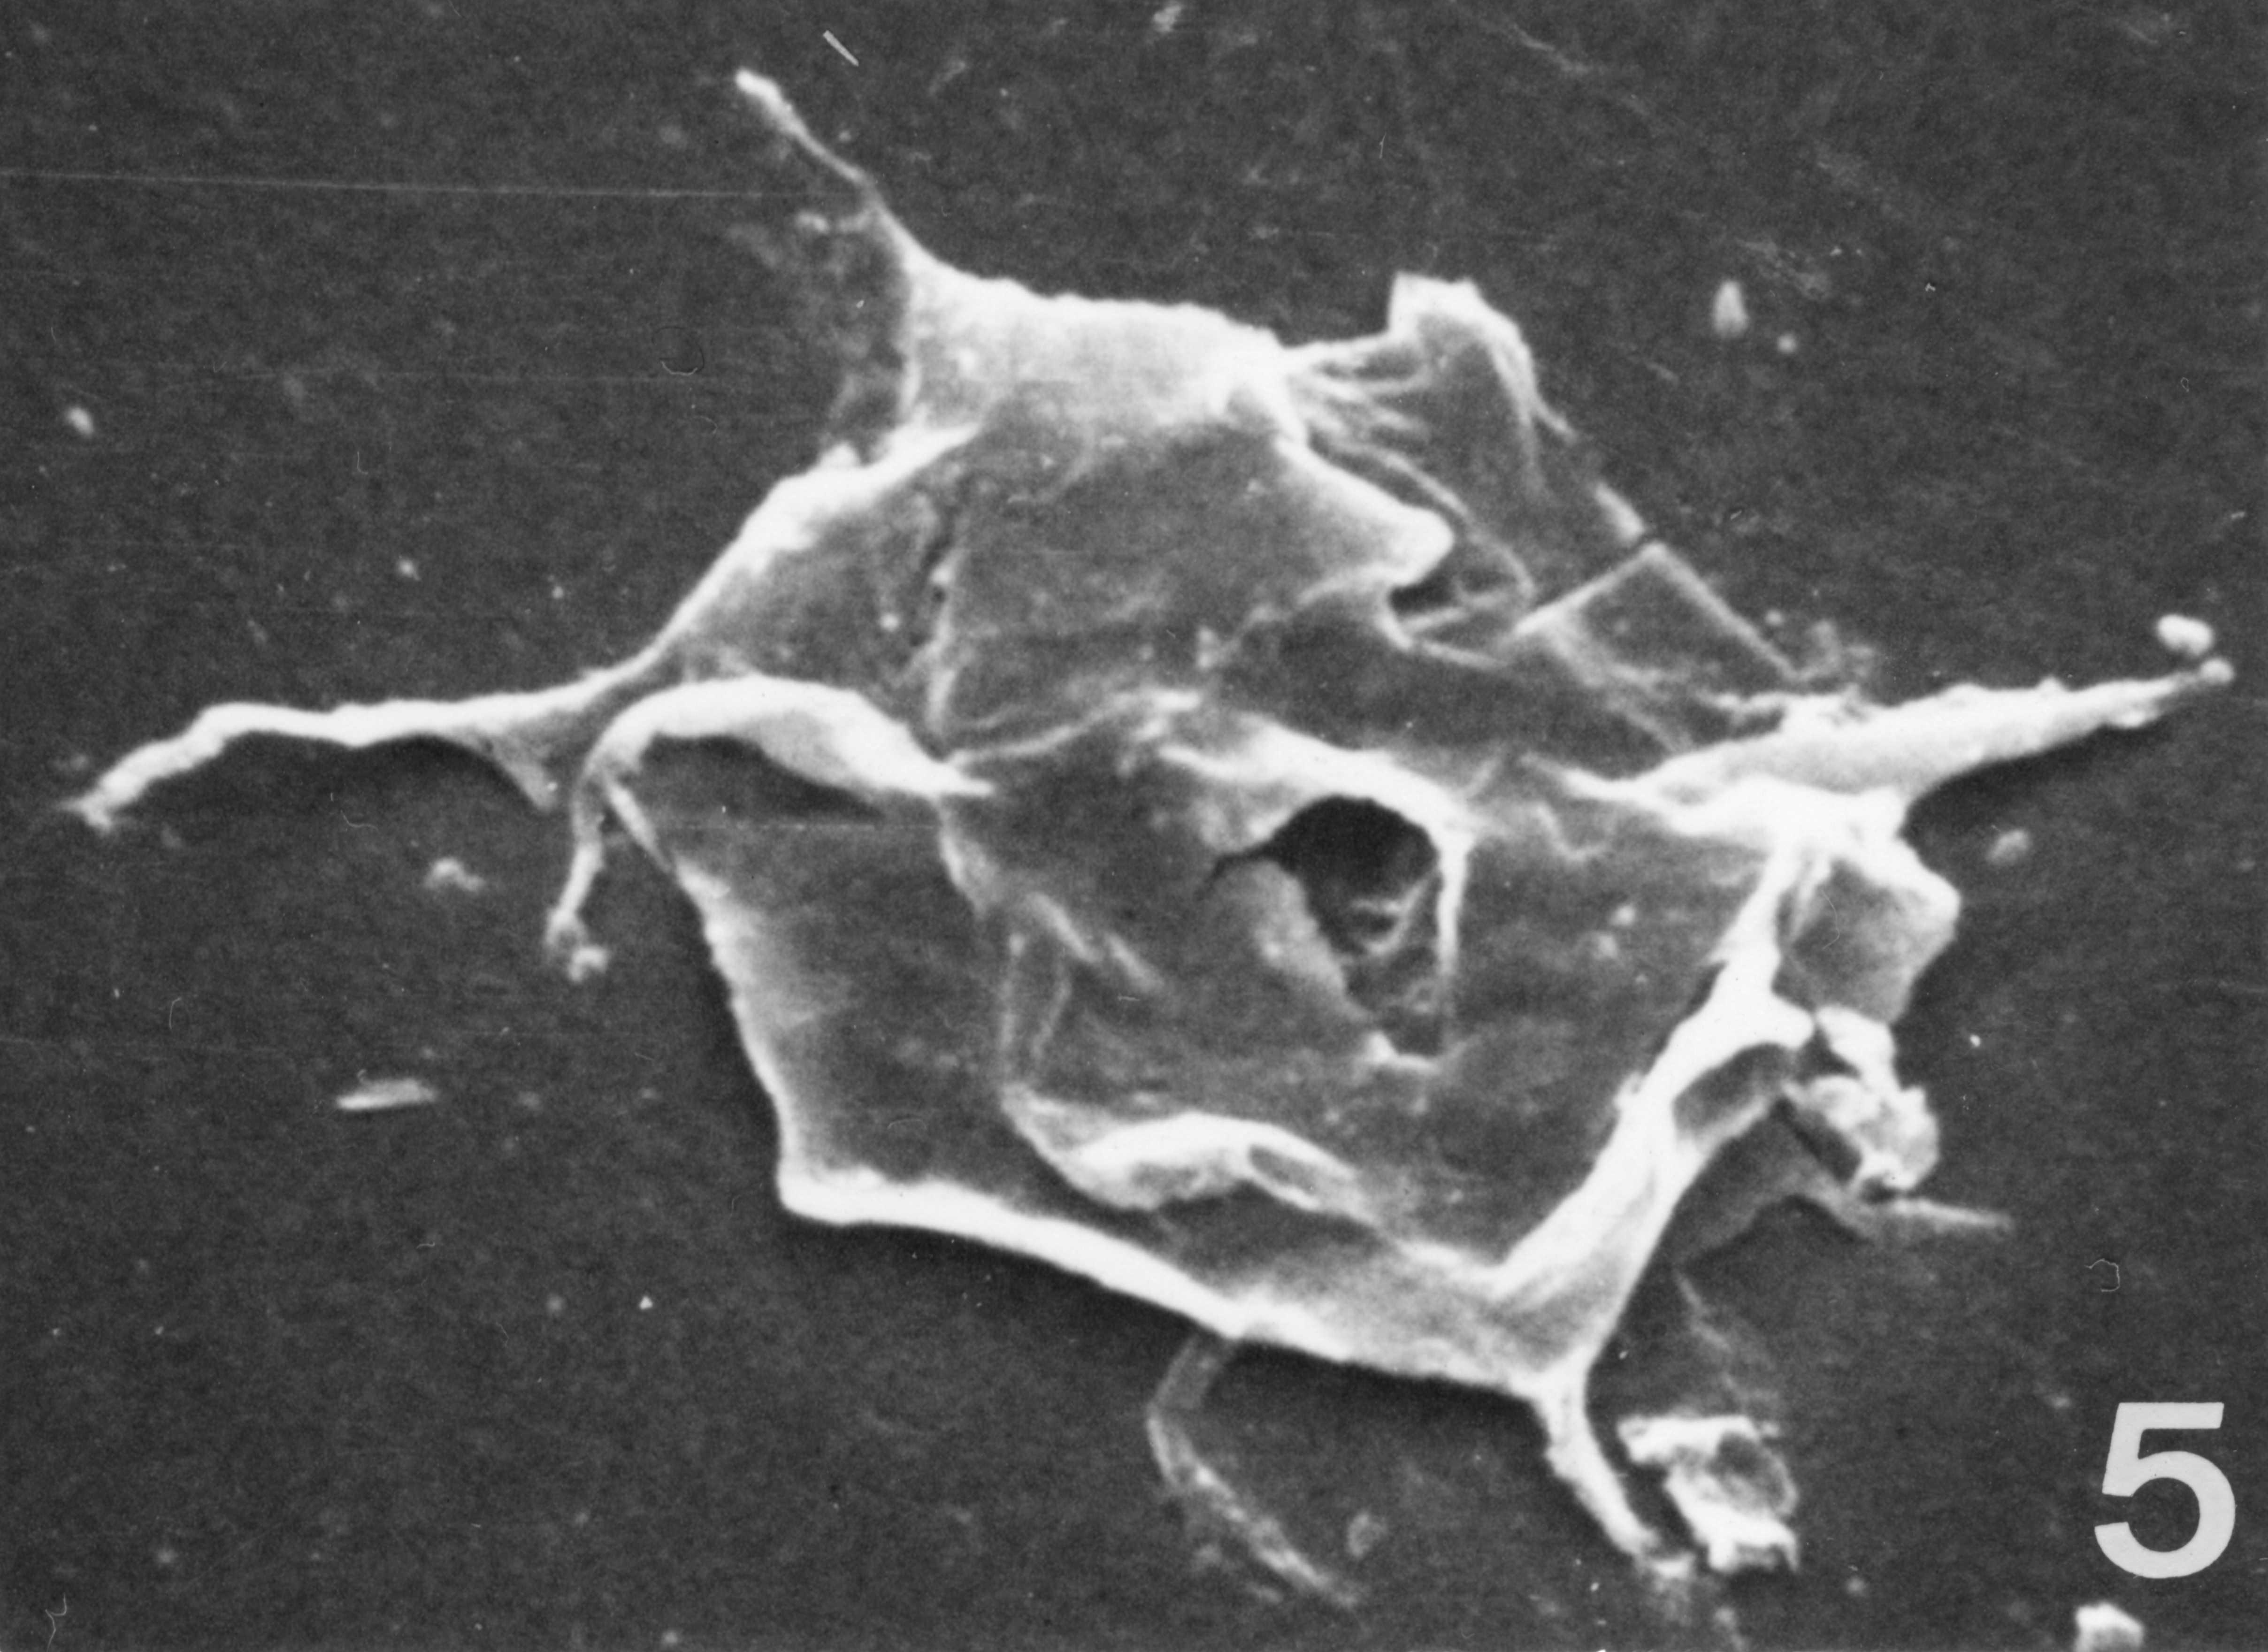 Fig. 5 - lmpluviculus ? sp. CHE-31. I. R. Se. N. B. N° b533.